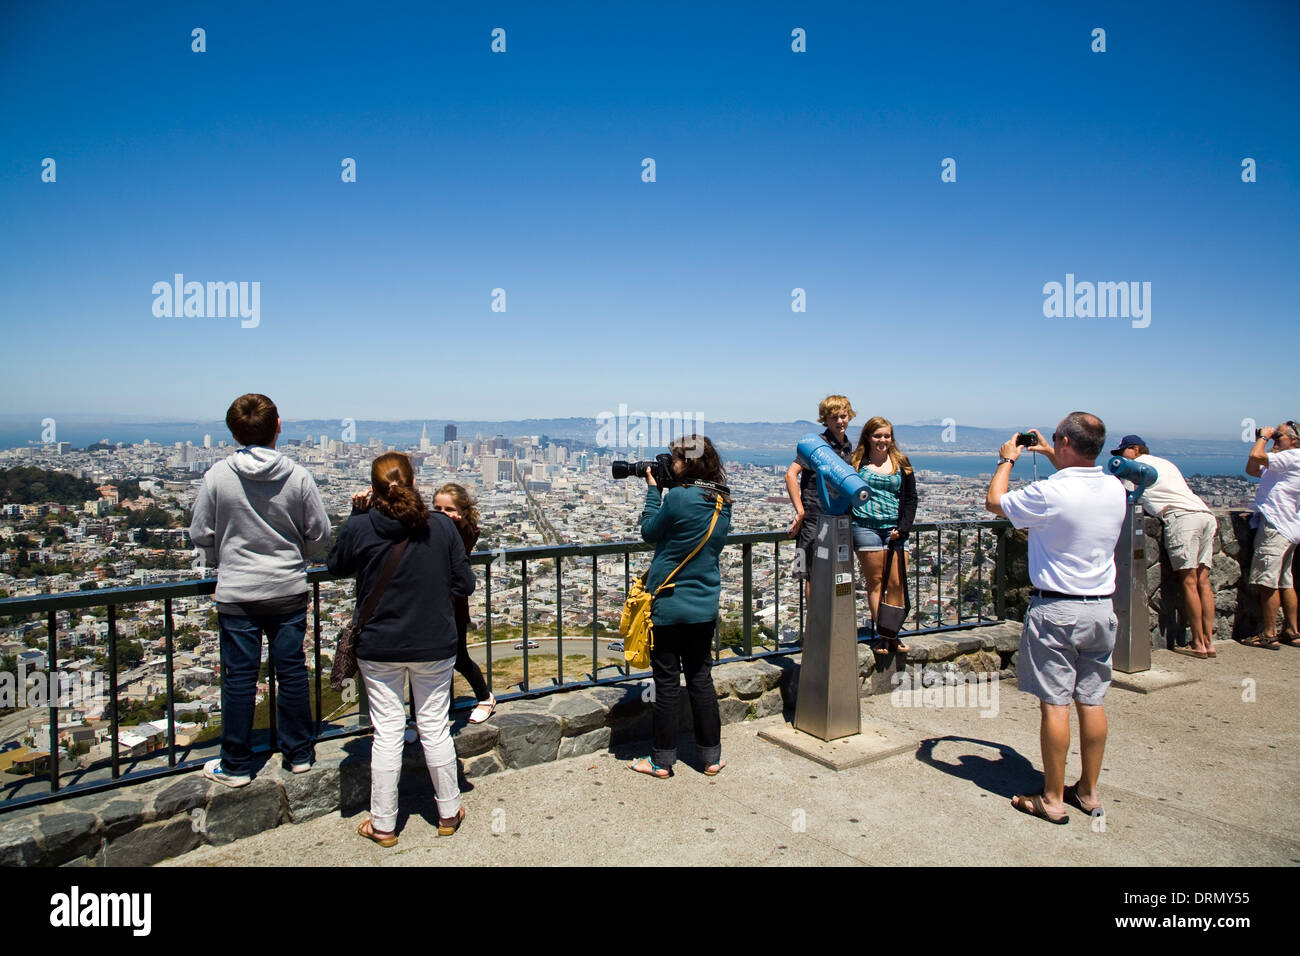 Tourists at Twin Peaks San Francisco city viewpoint, CA, California, USA - Stock Image